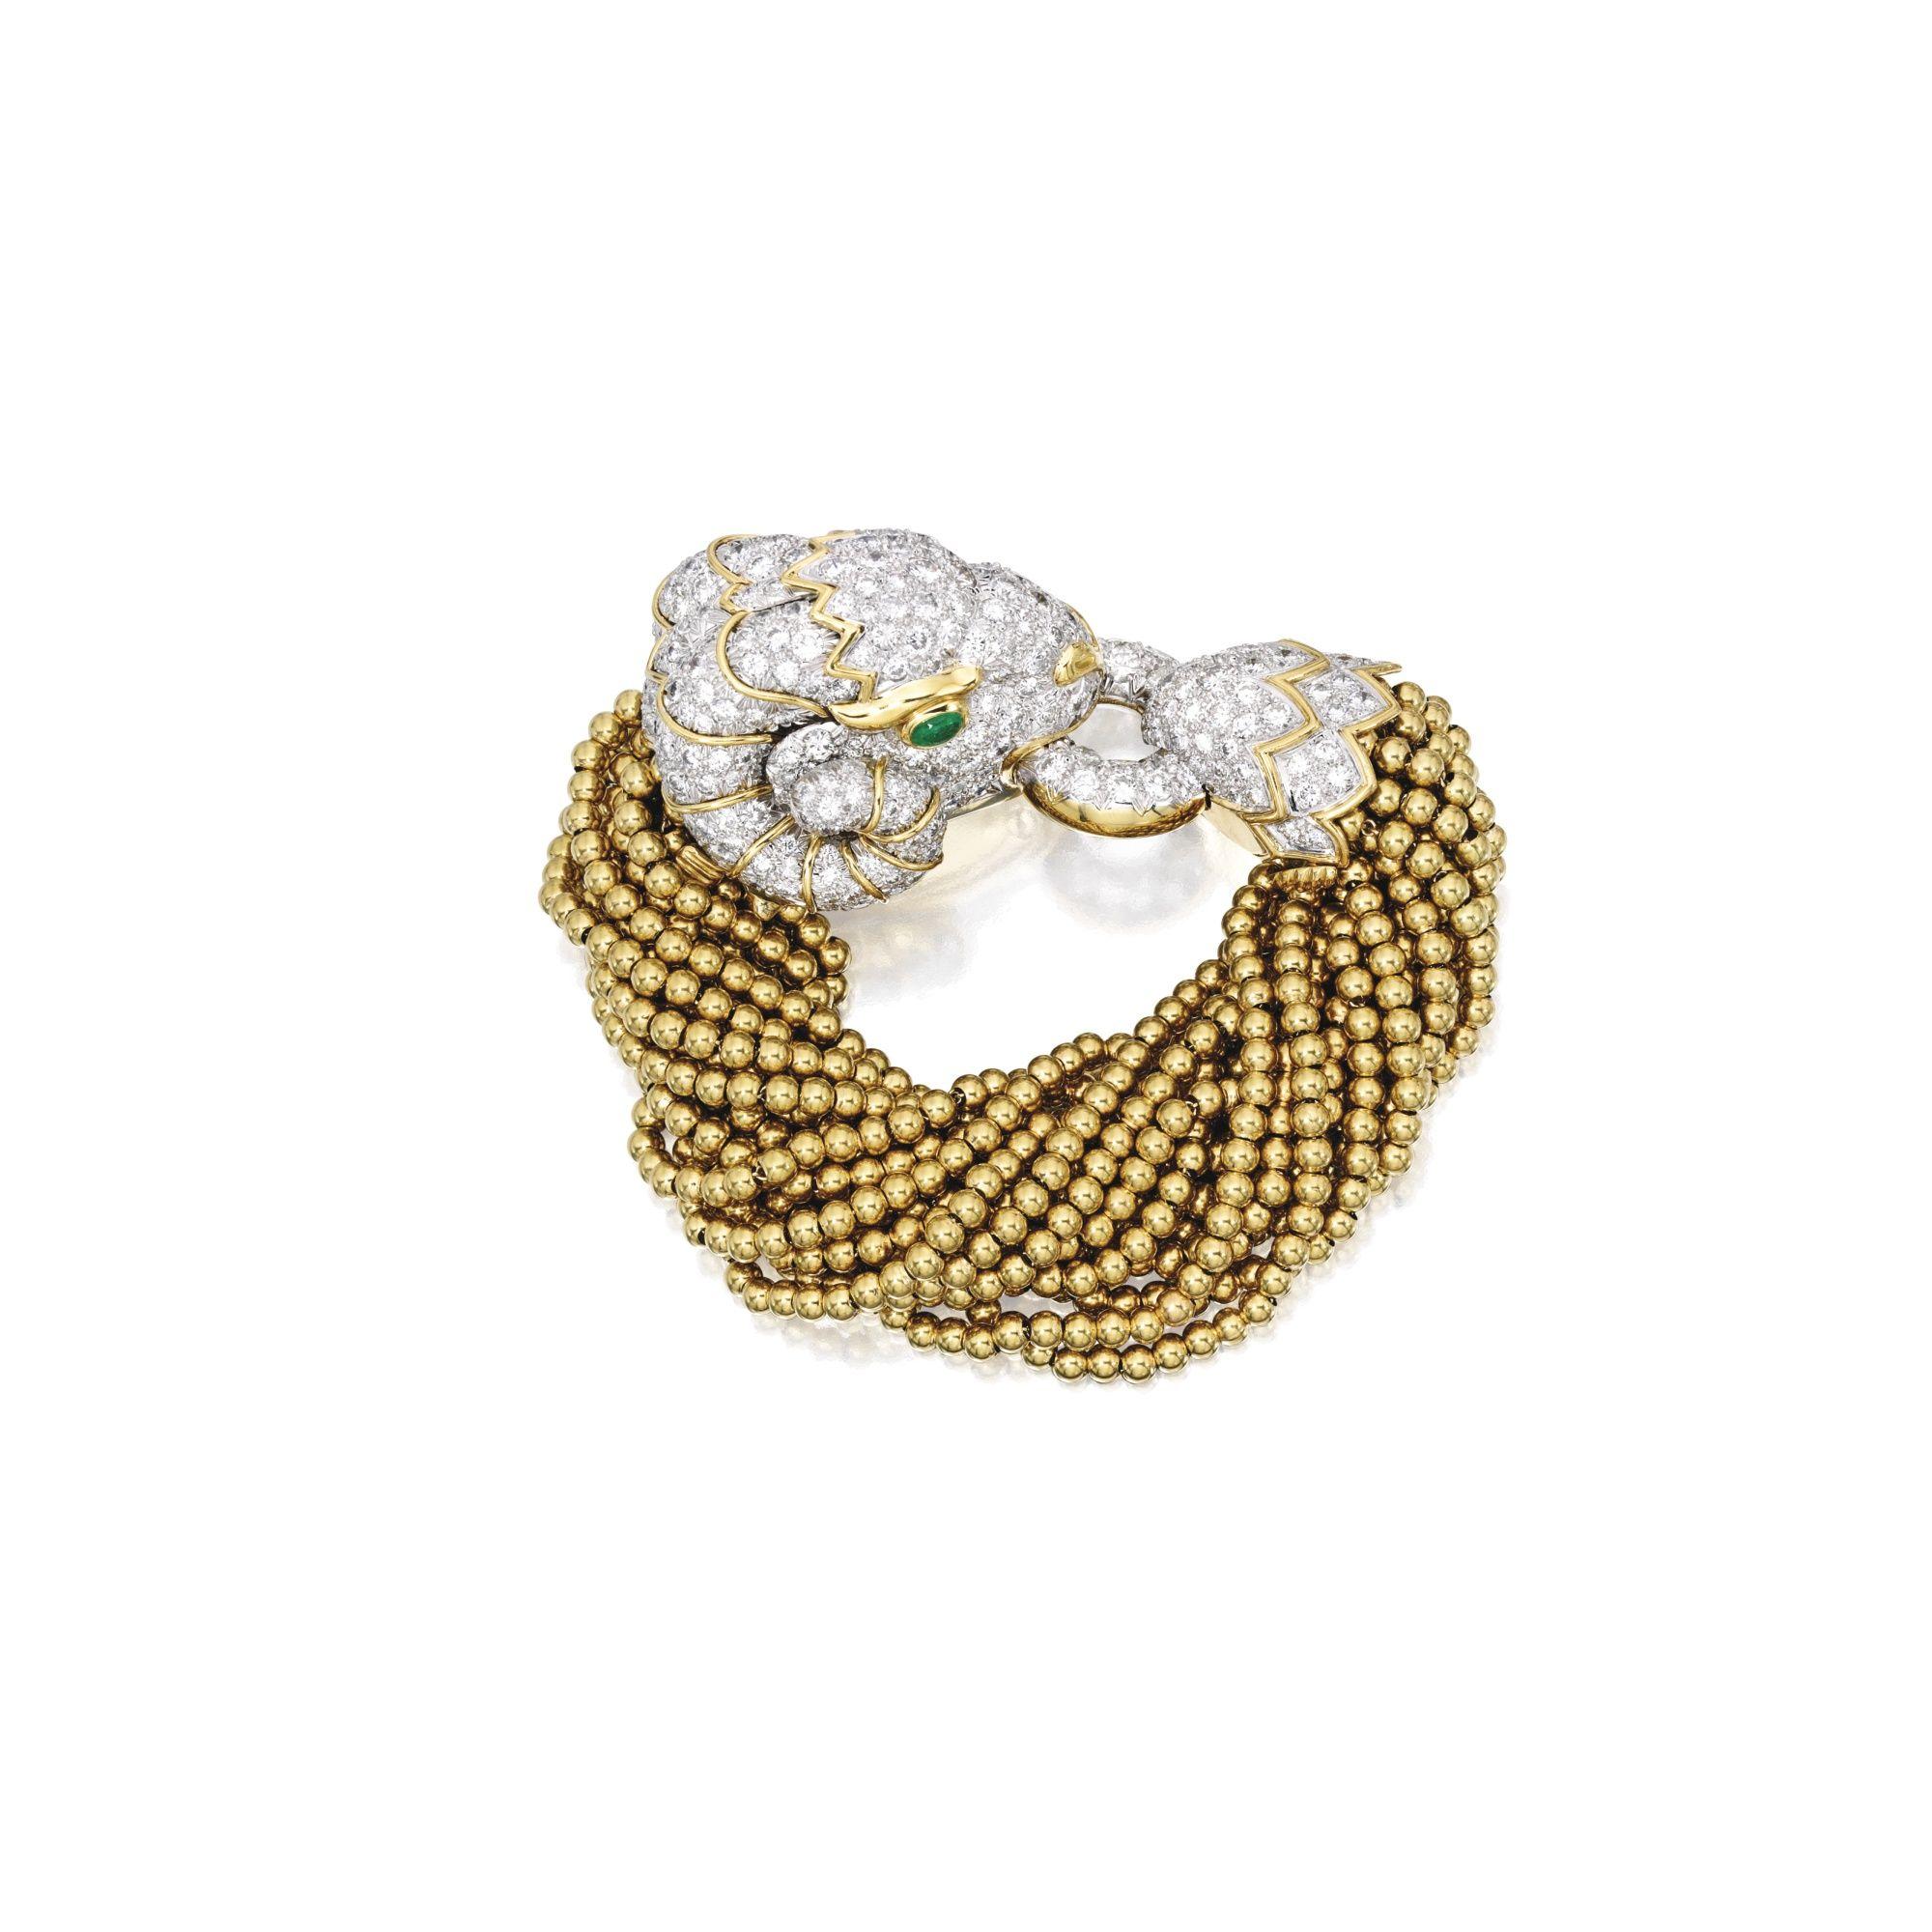 05048ebabc4 18 Karat Gold, Platinum, Diamond and Emerald Bracelet, David Webb The clasp  designed as a pavé-set ram's head set with round diamonds weighing  approximately ...